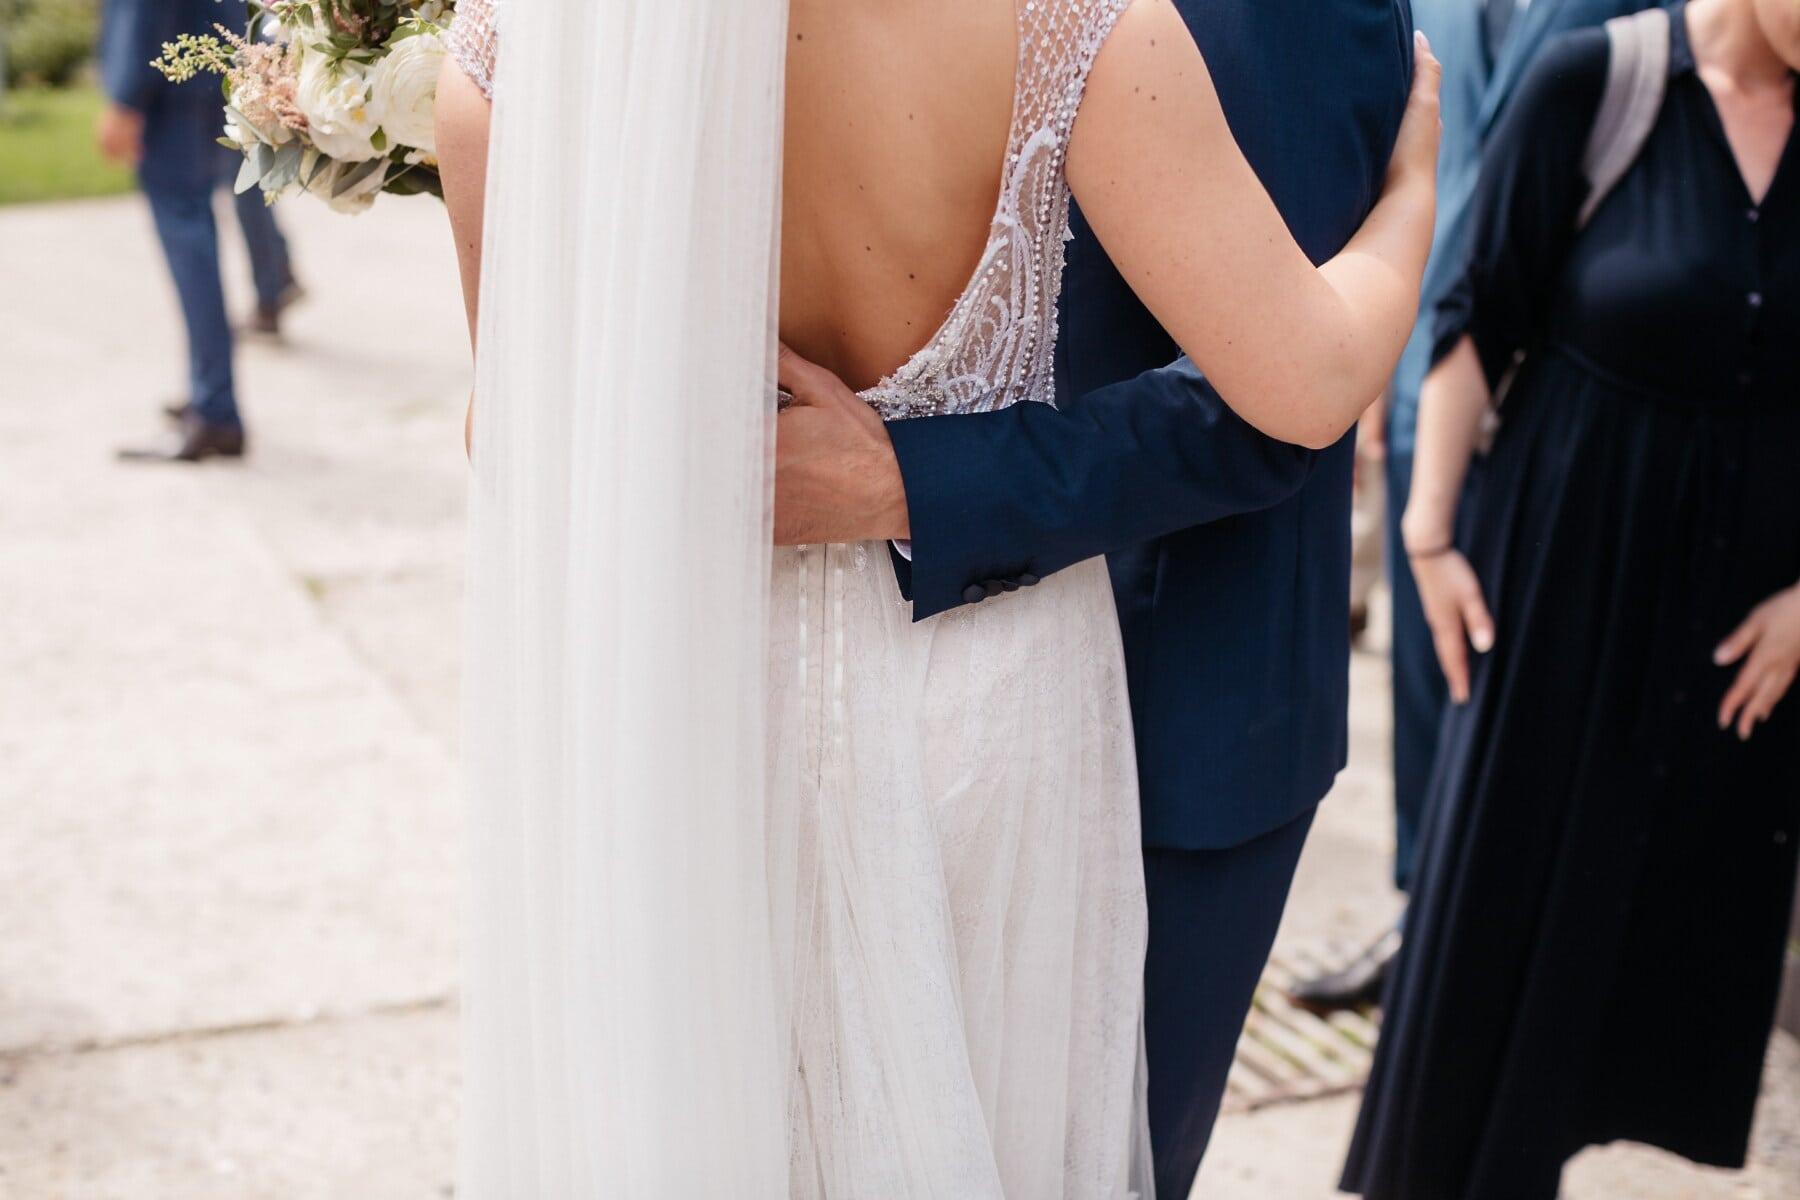 groom, dance, dancing, just married, bride, love, wedding, woman, fashion, street